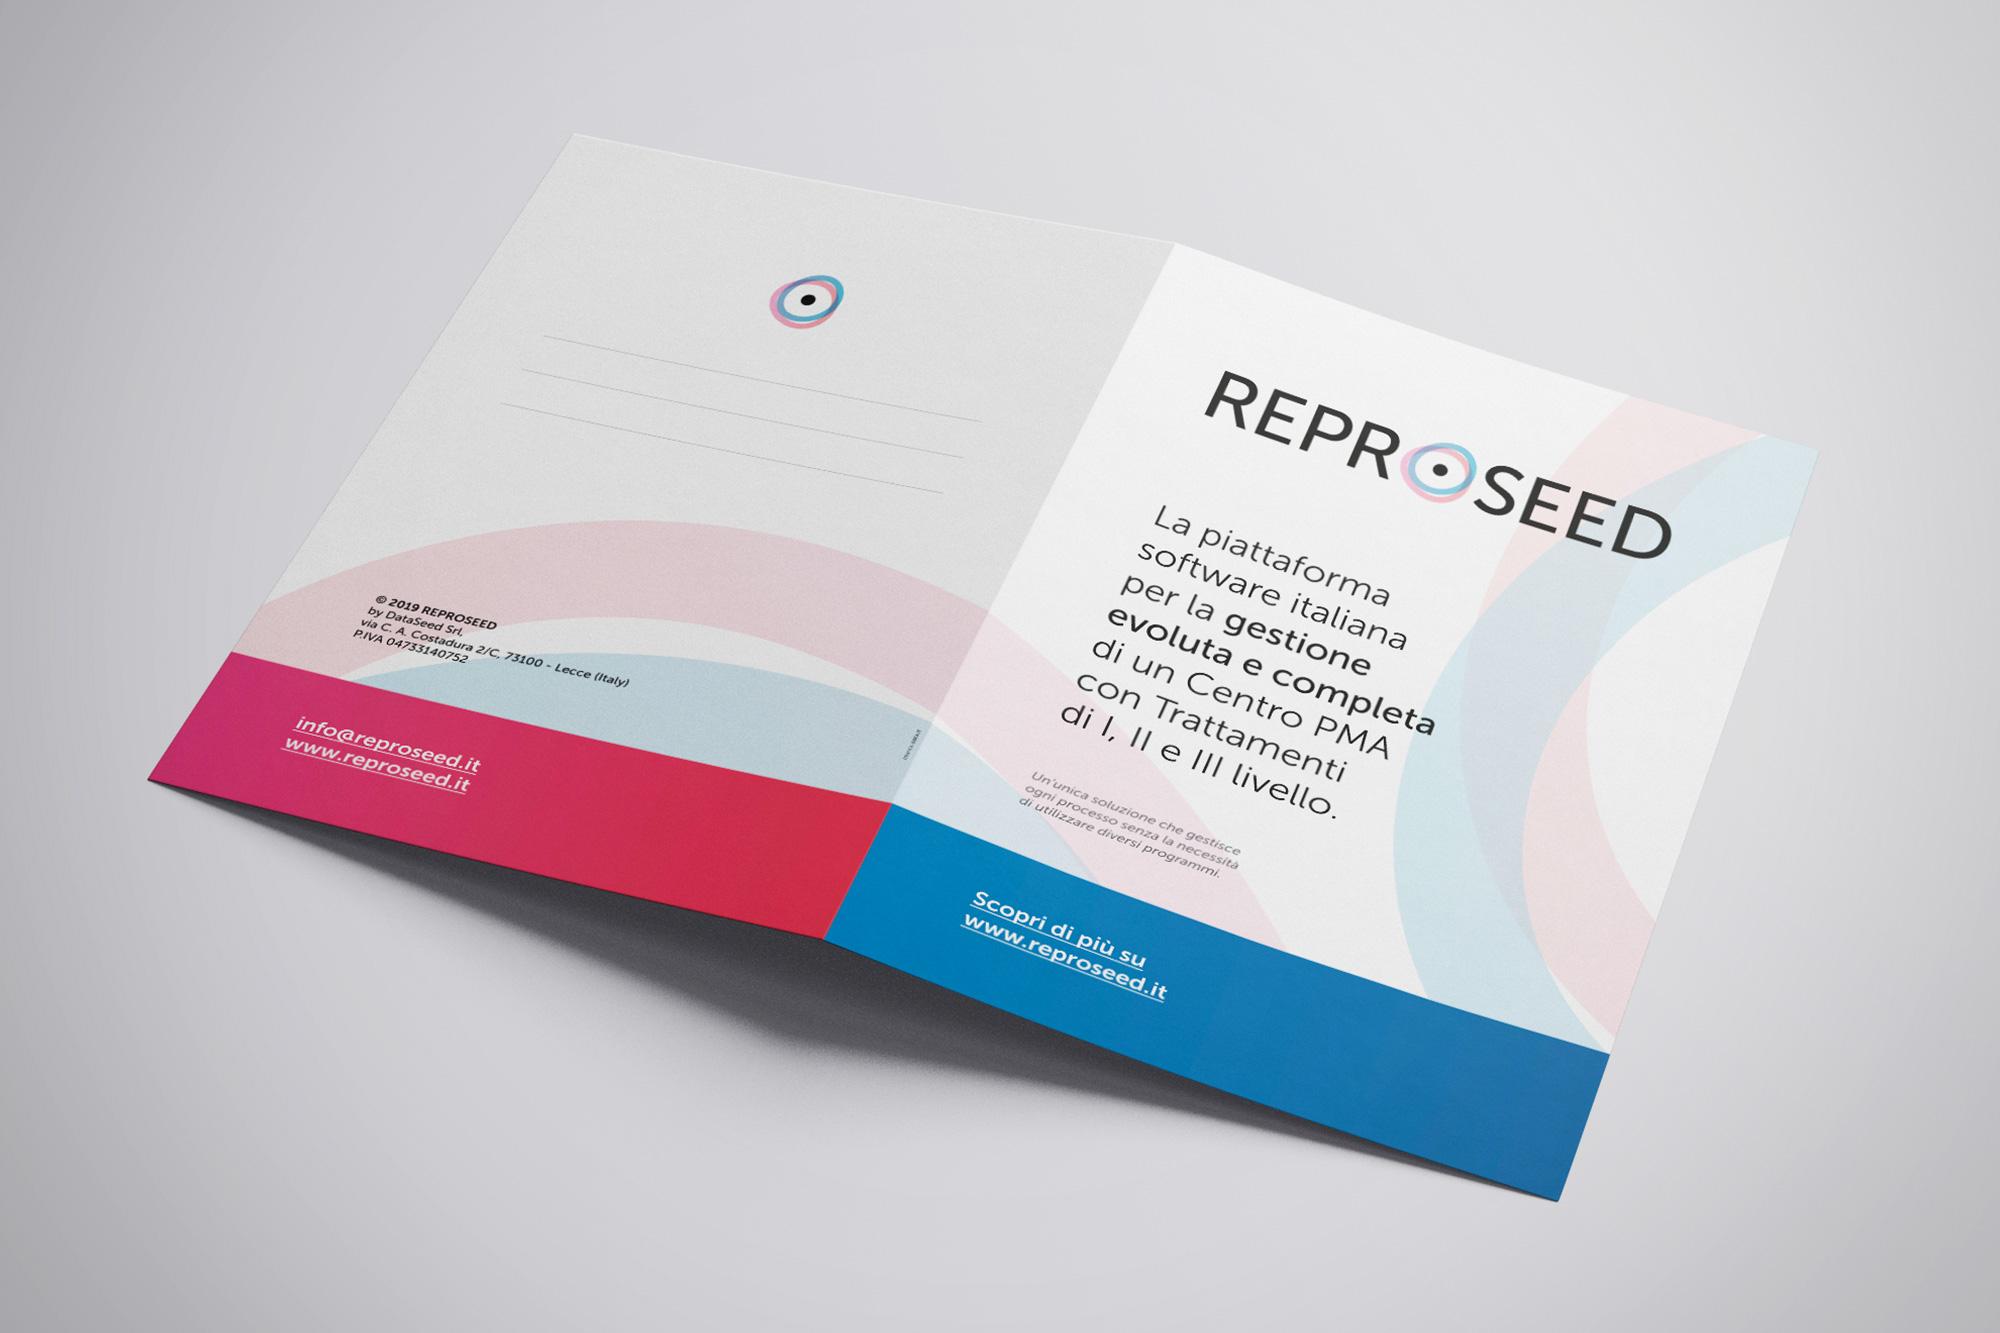 REPROSEED – logo, branding, adv, web - img 5